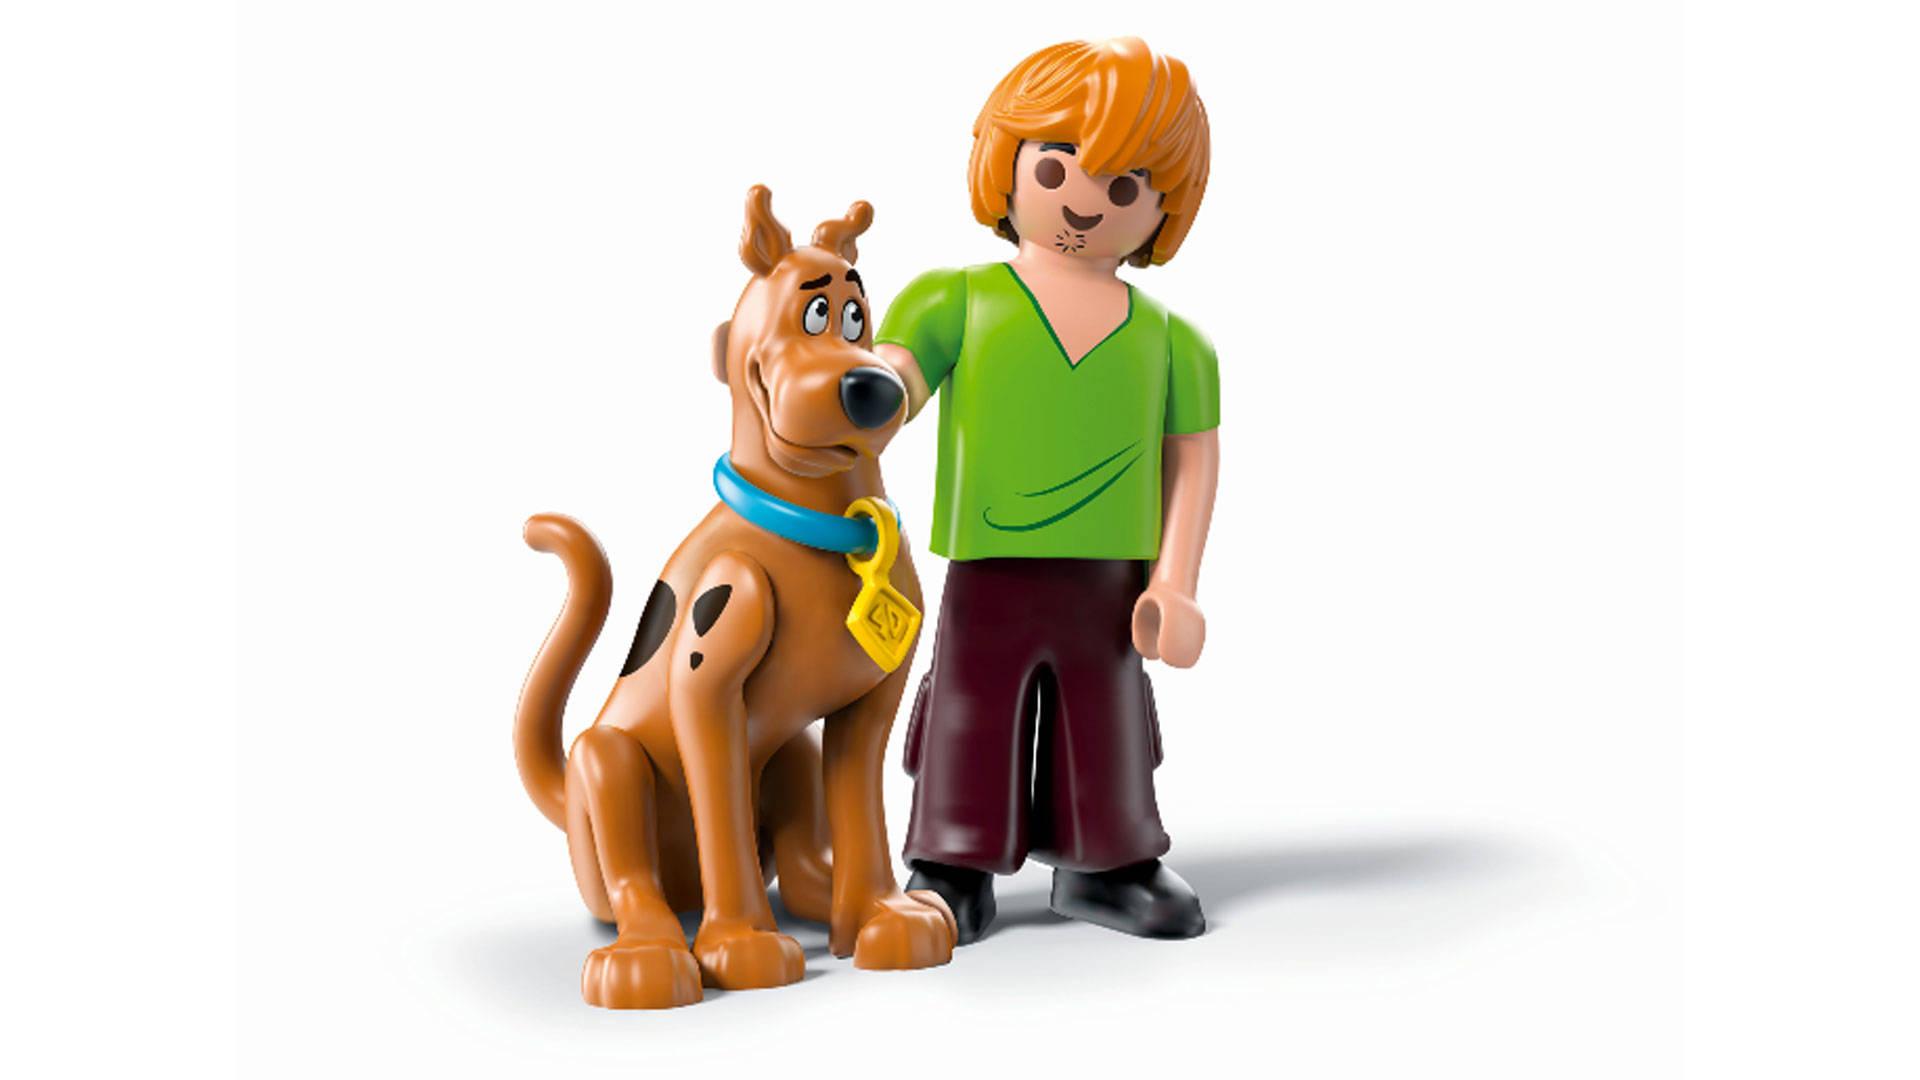 Playmobil Scooby-Doo